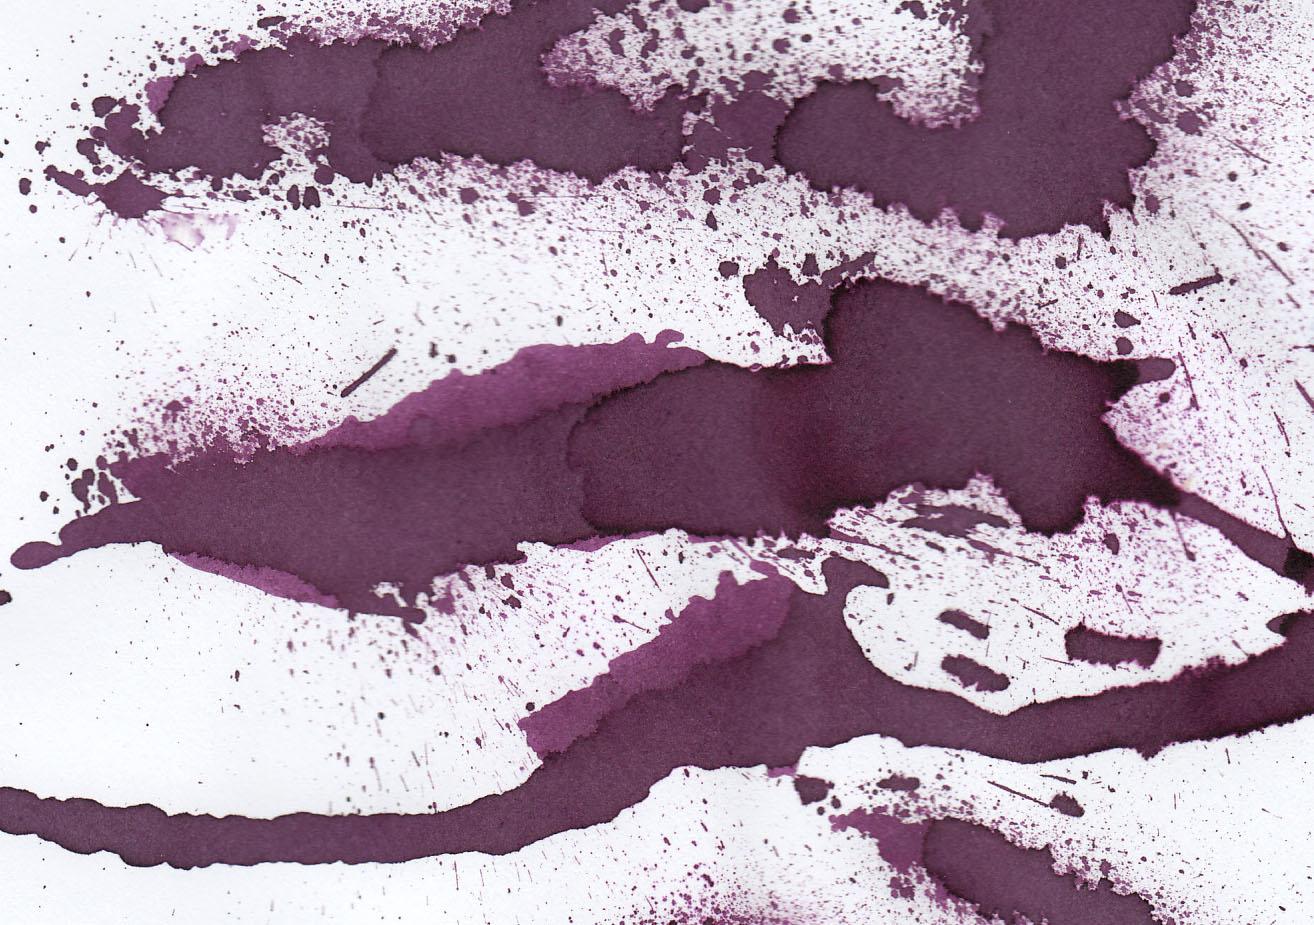 fpn_1464507465__lavender_is.jpg